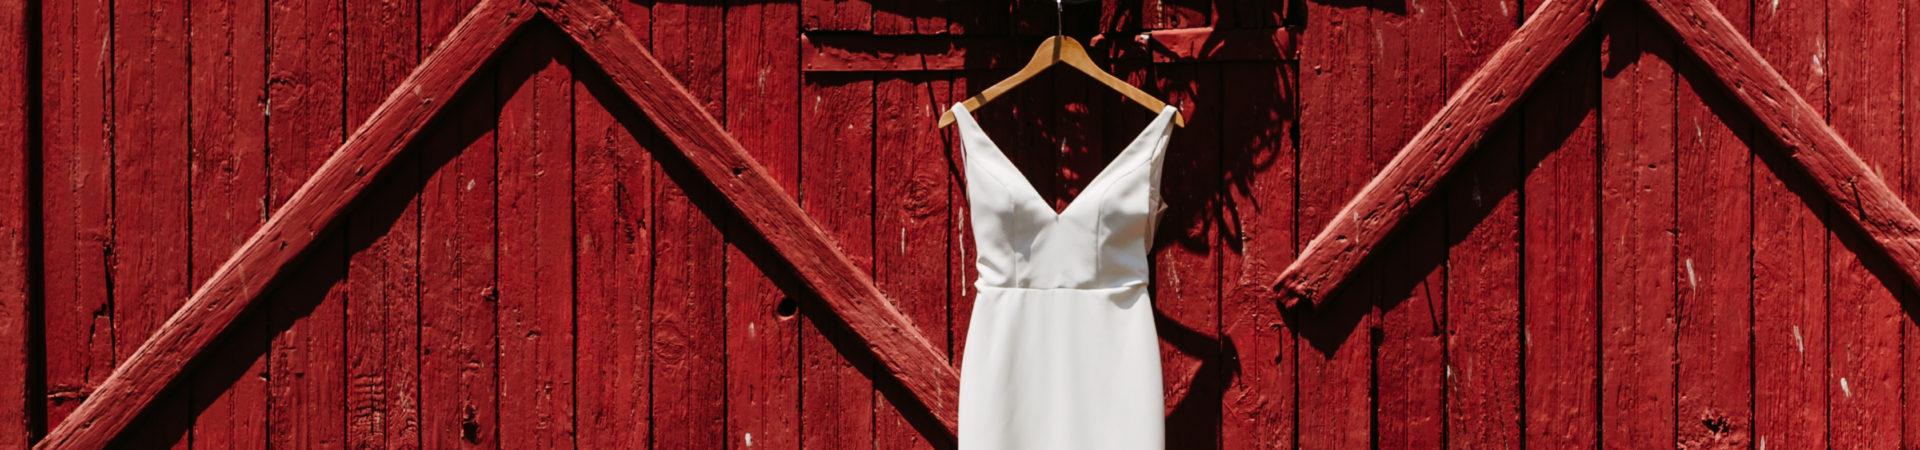 red barn door with hanging white wedding dress